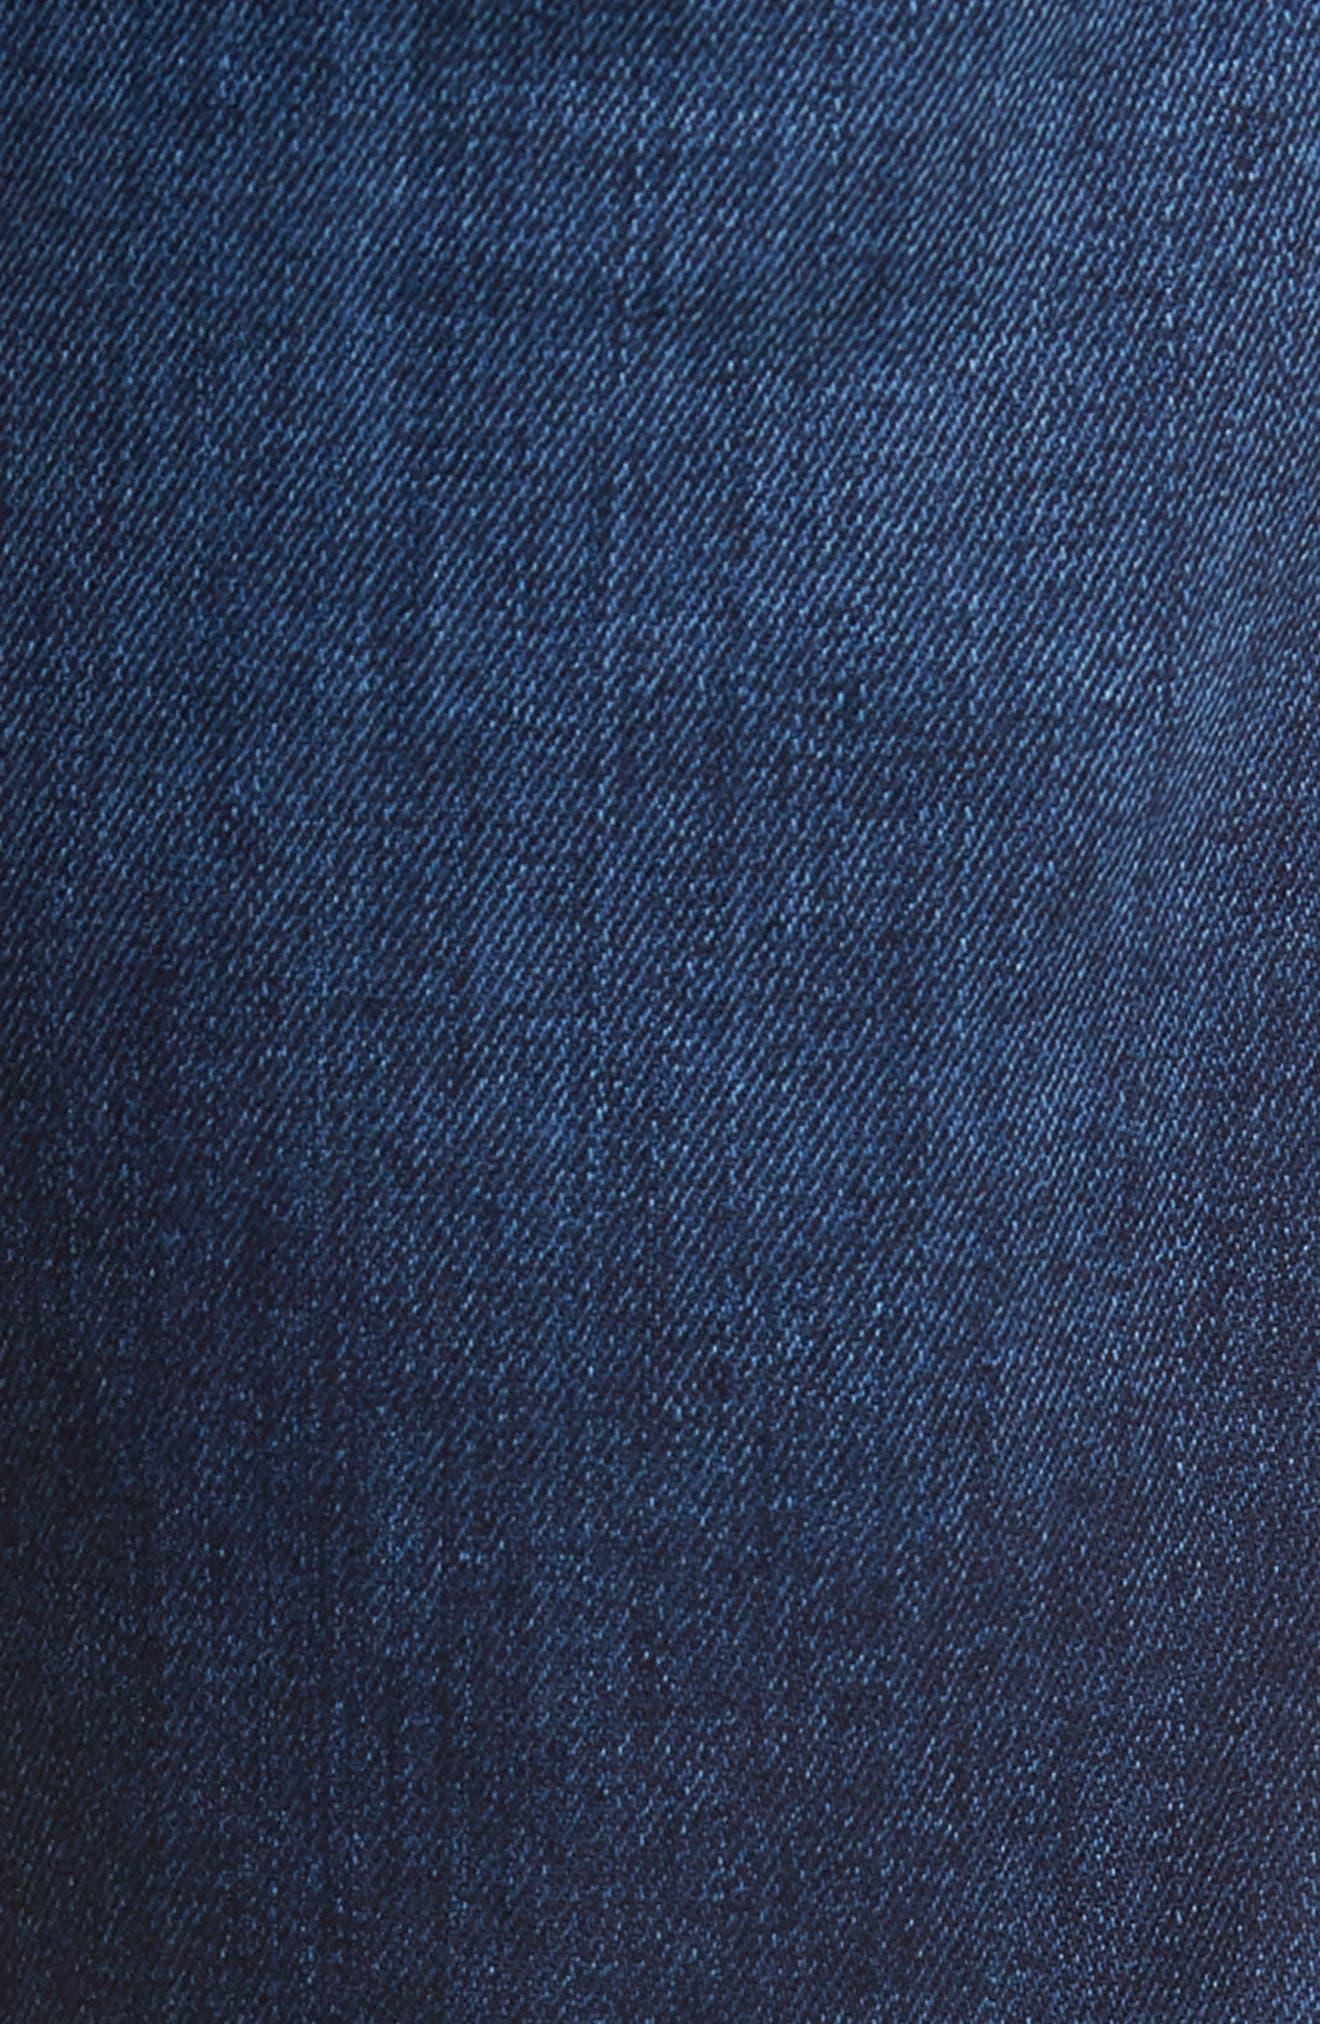 708 Stretch Slim Fit Jeans,                             Alternate thumbnail 5, color,                             BLUE